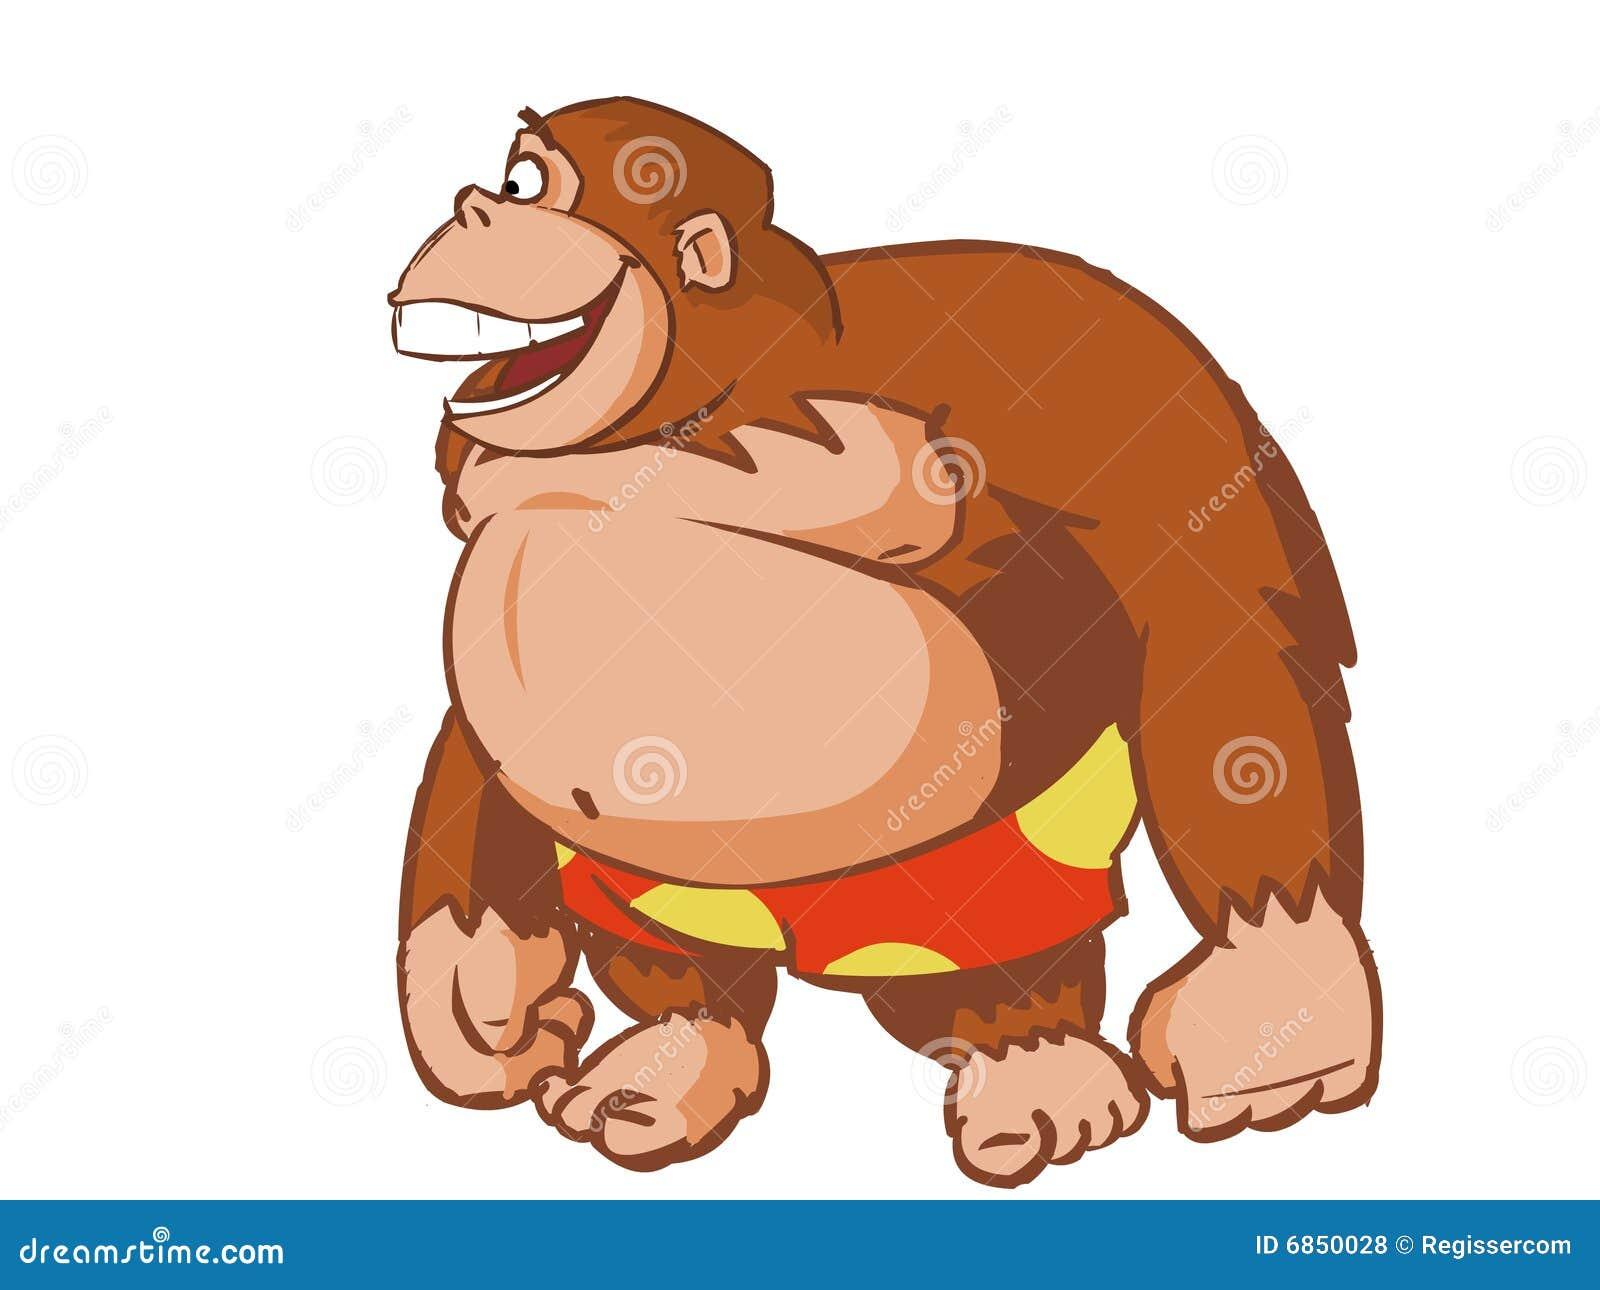 Orangutan Cartoon Laughing Orangutan